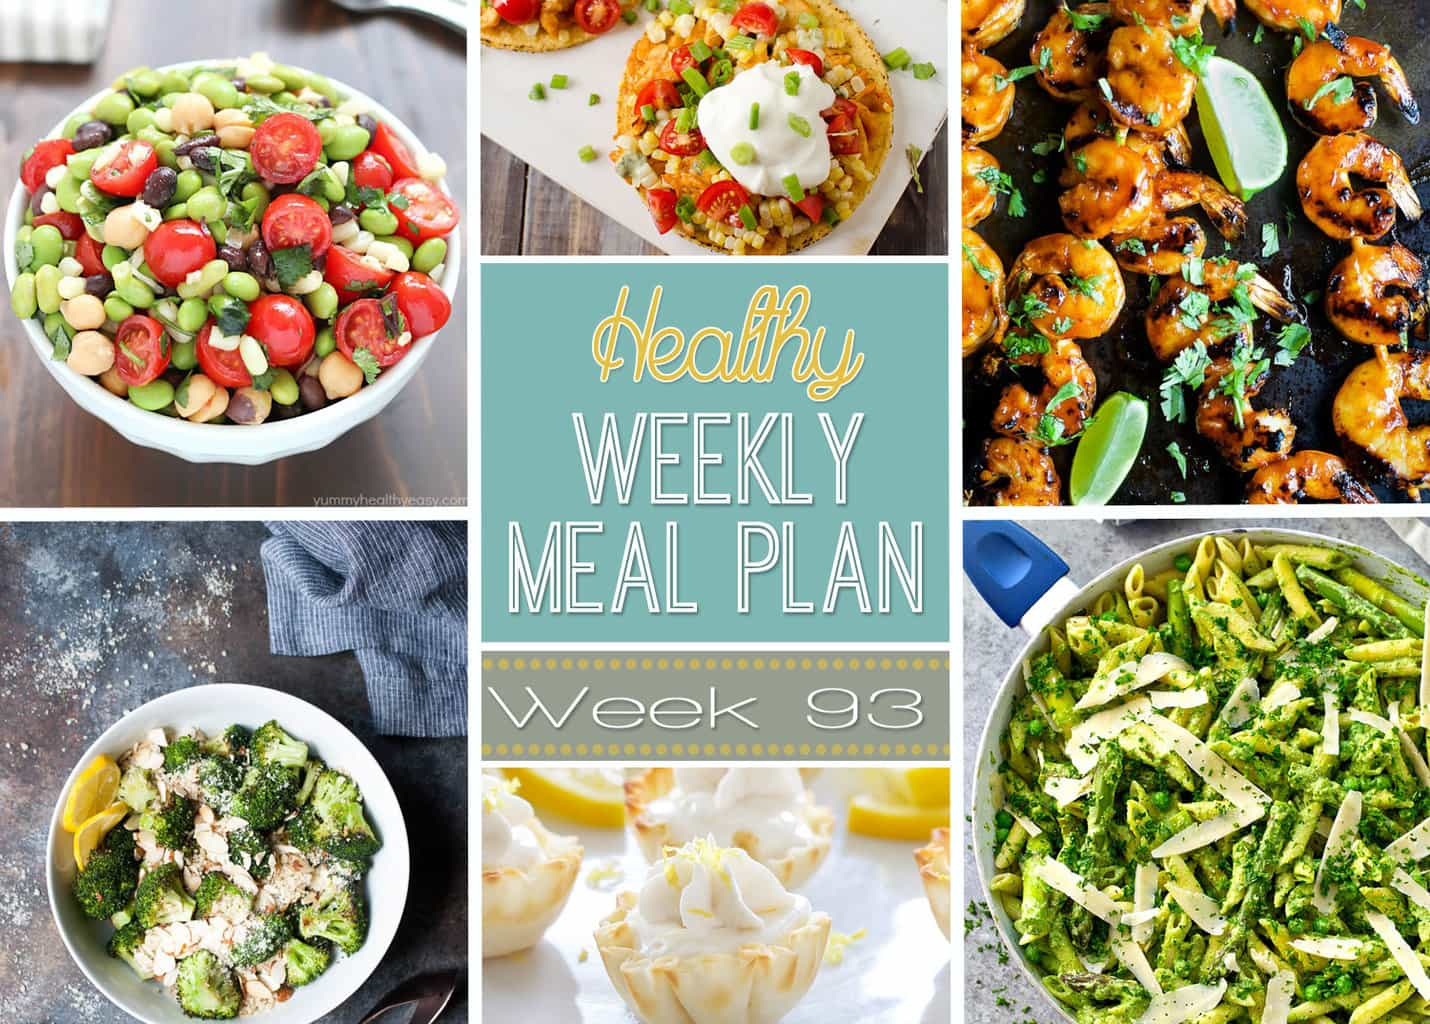 Healthy Weekly Meal Plan 93